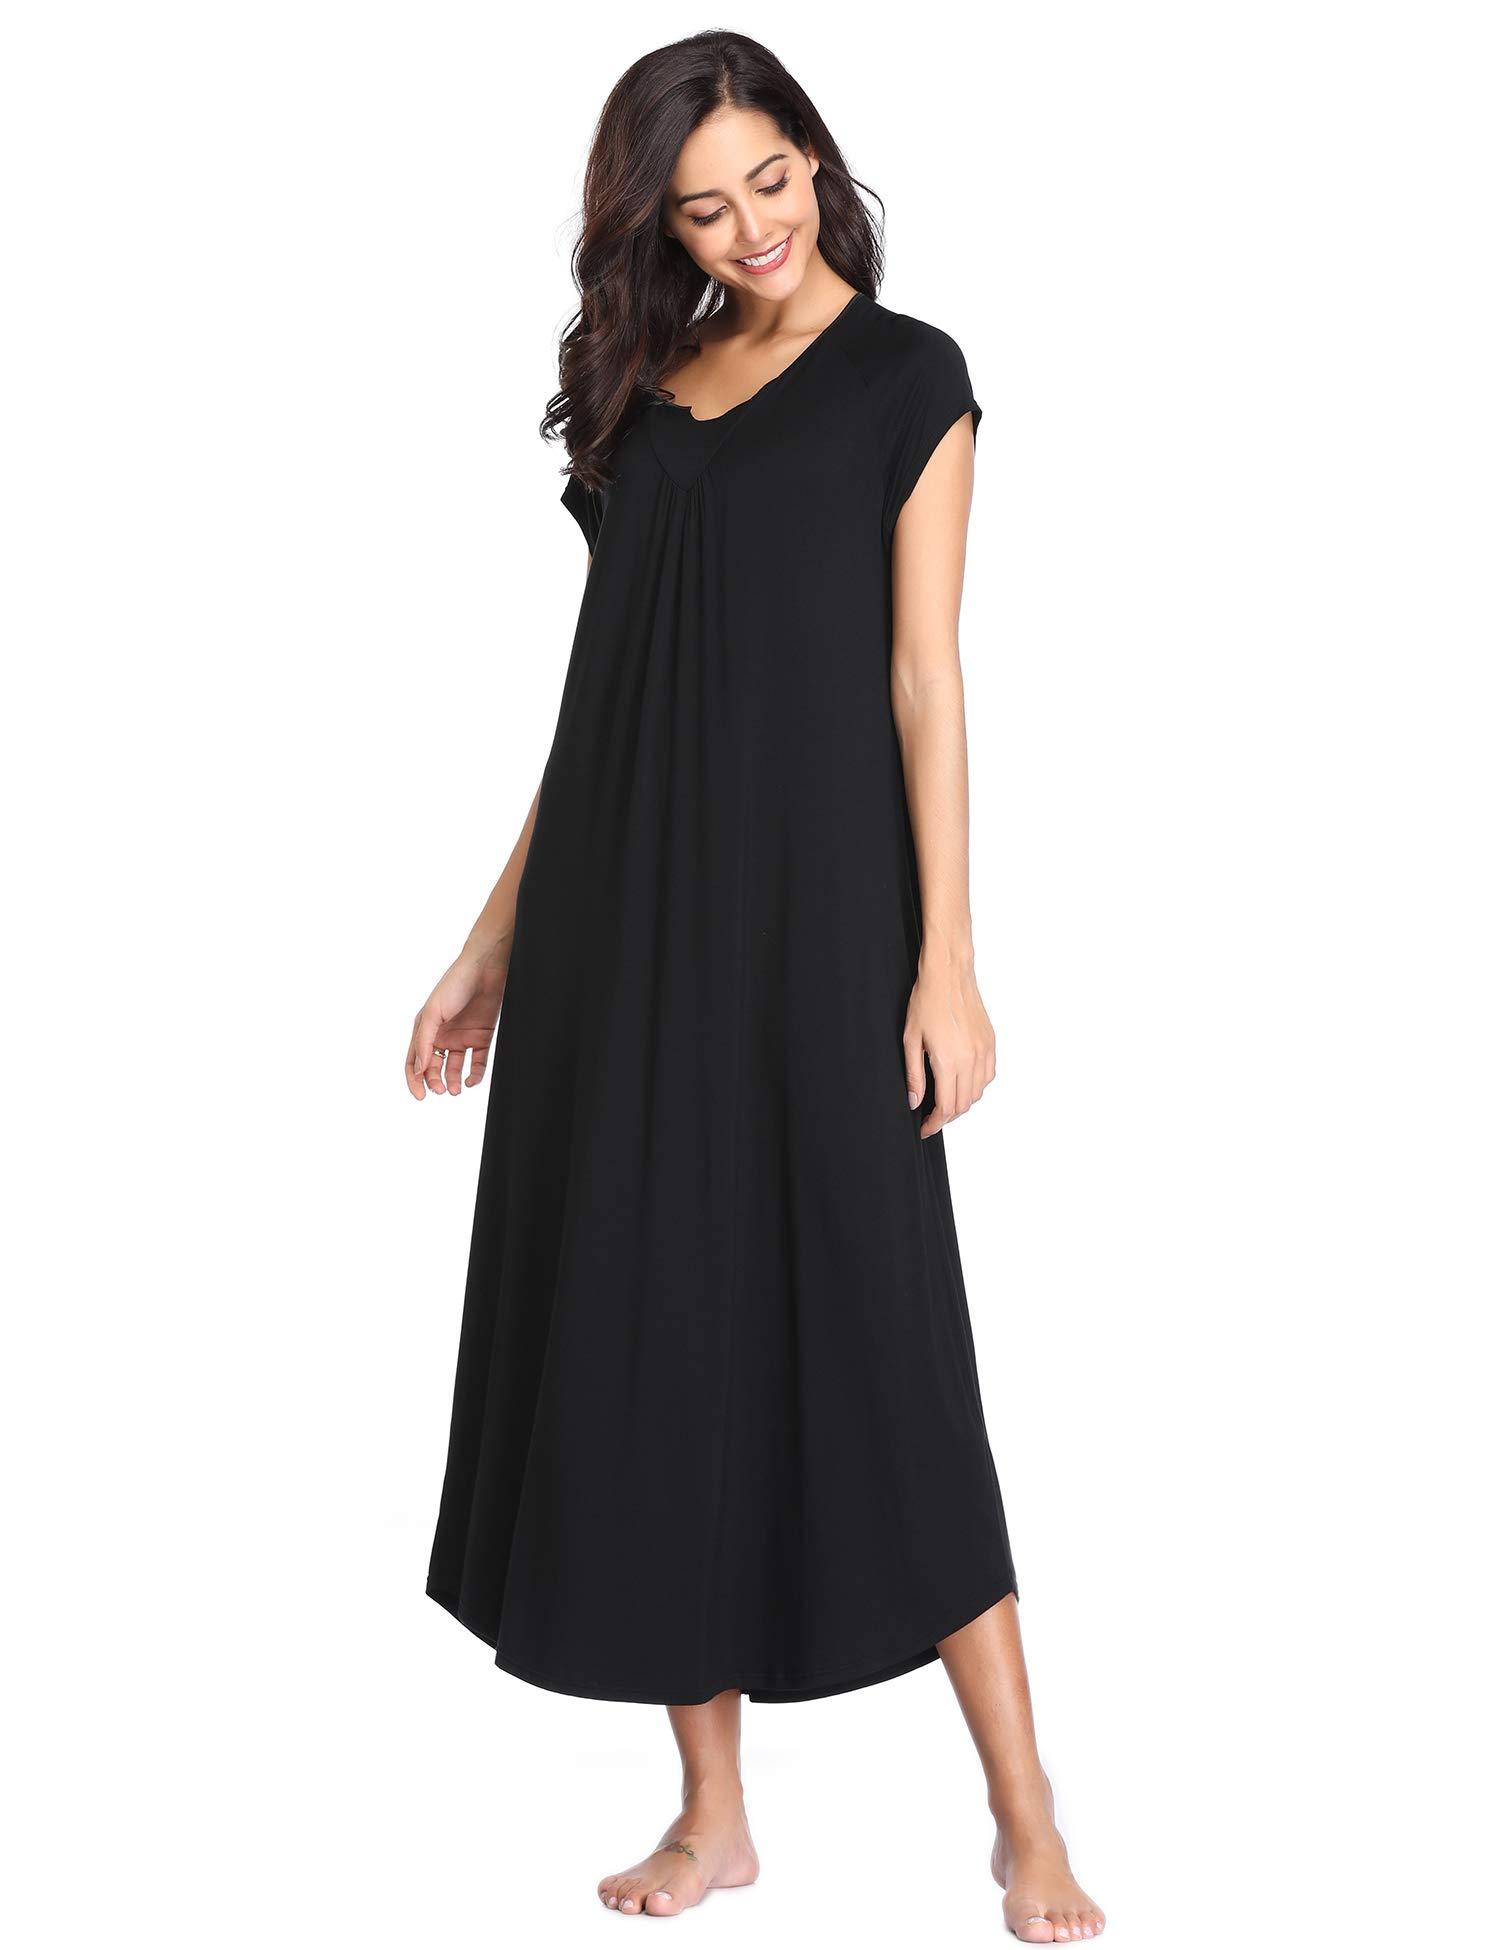 Lusofie Long Nightgowns Womens Button Nightshirts Short Sleeve Sleepwear